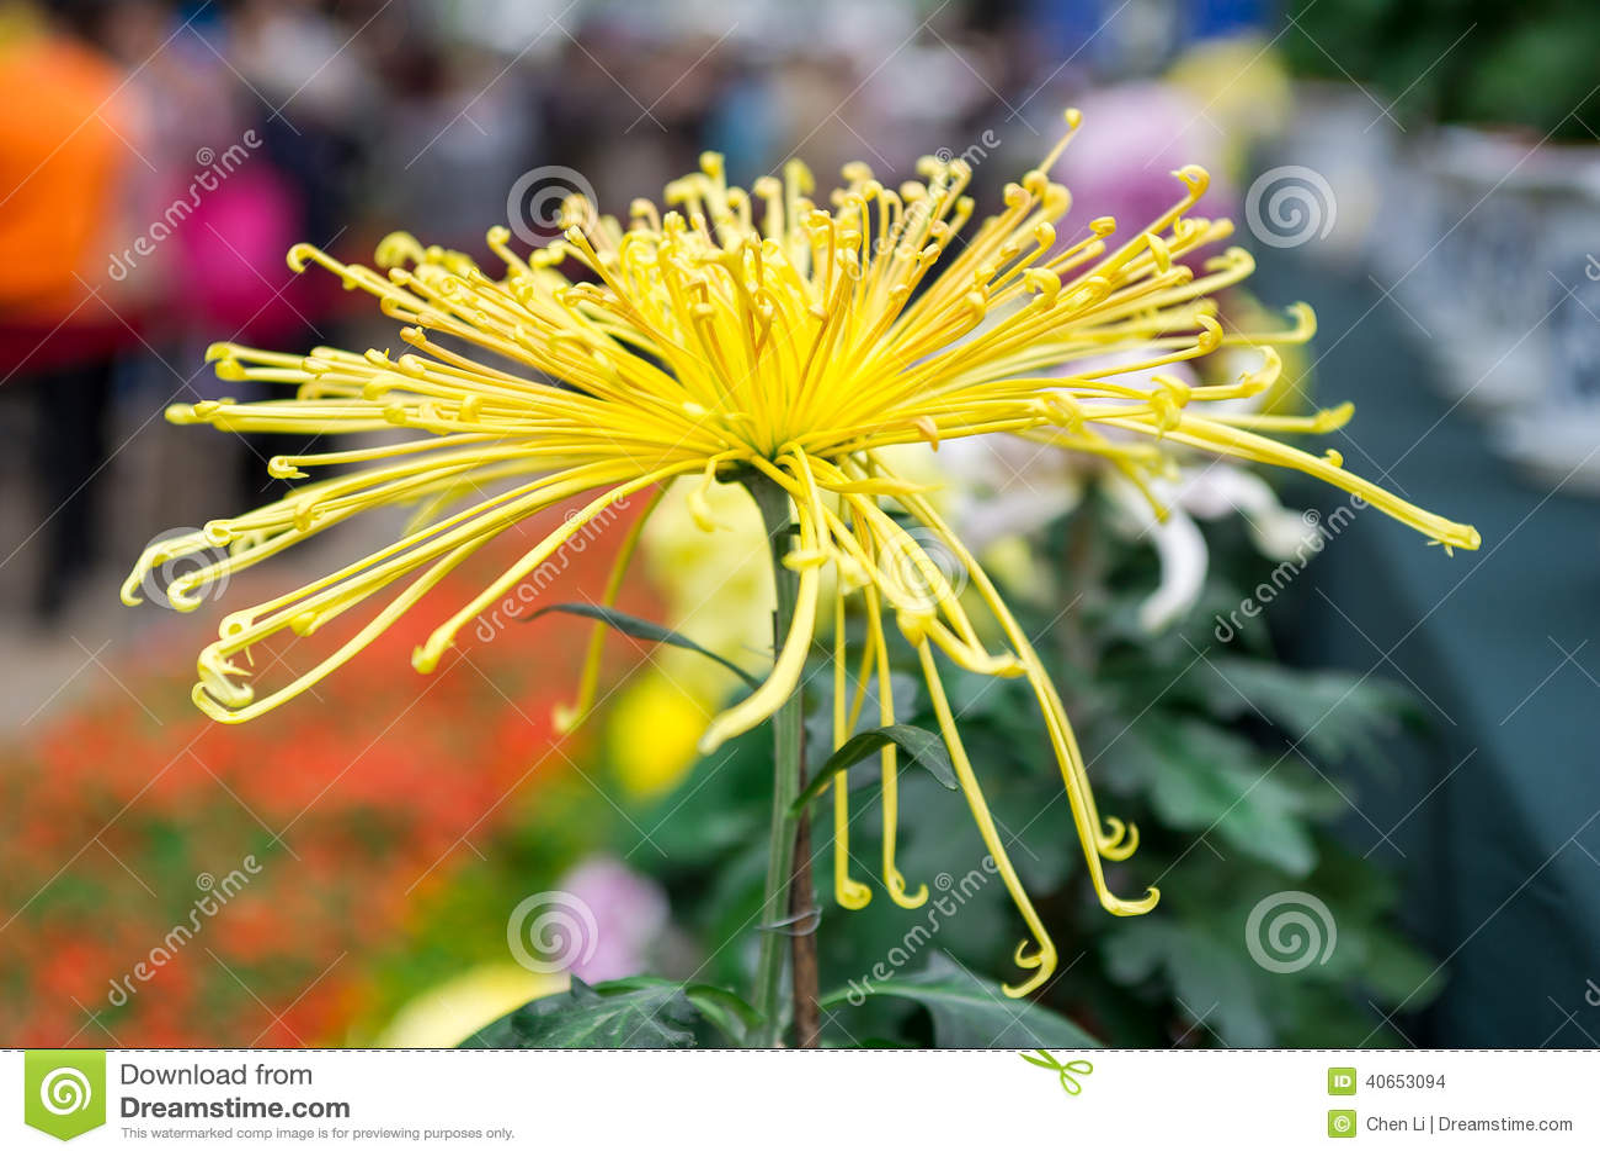 Chrysanthemum Stock Photo Image 40653094